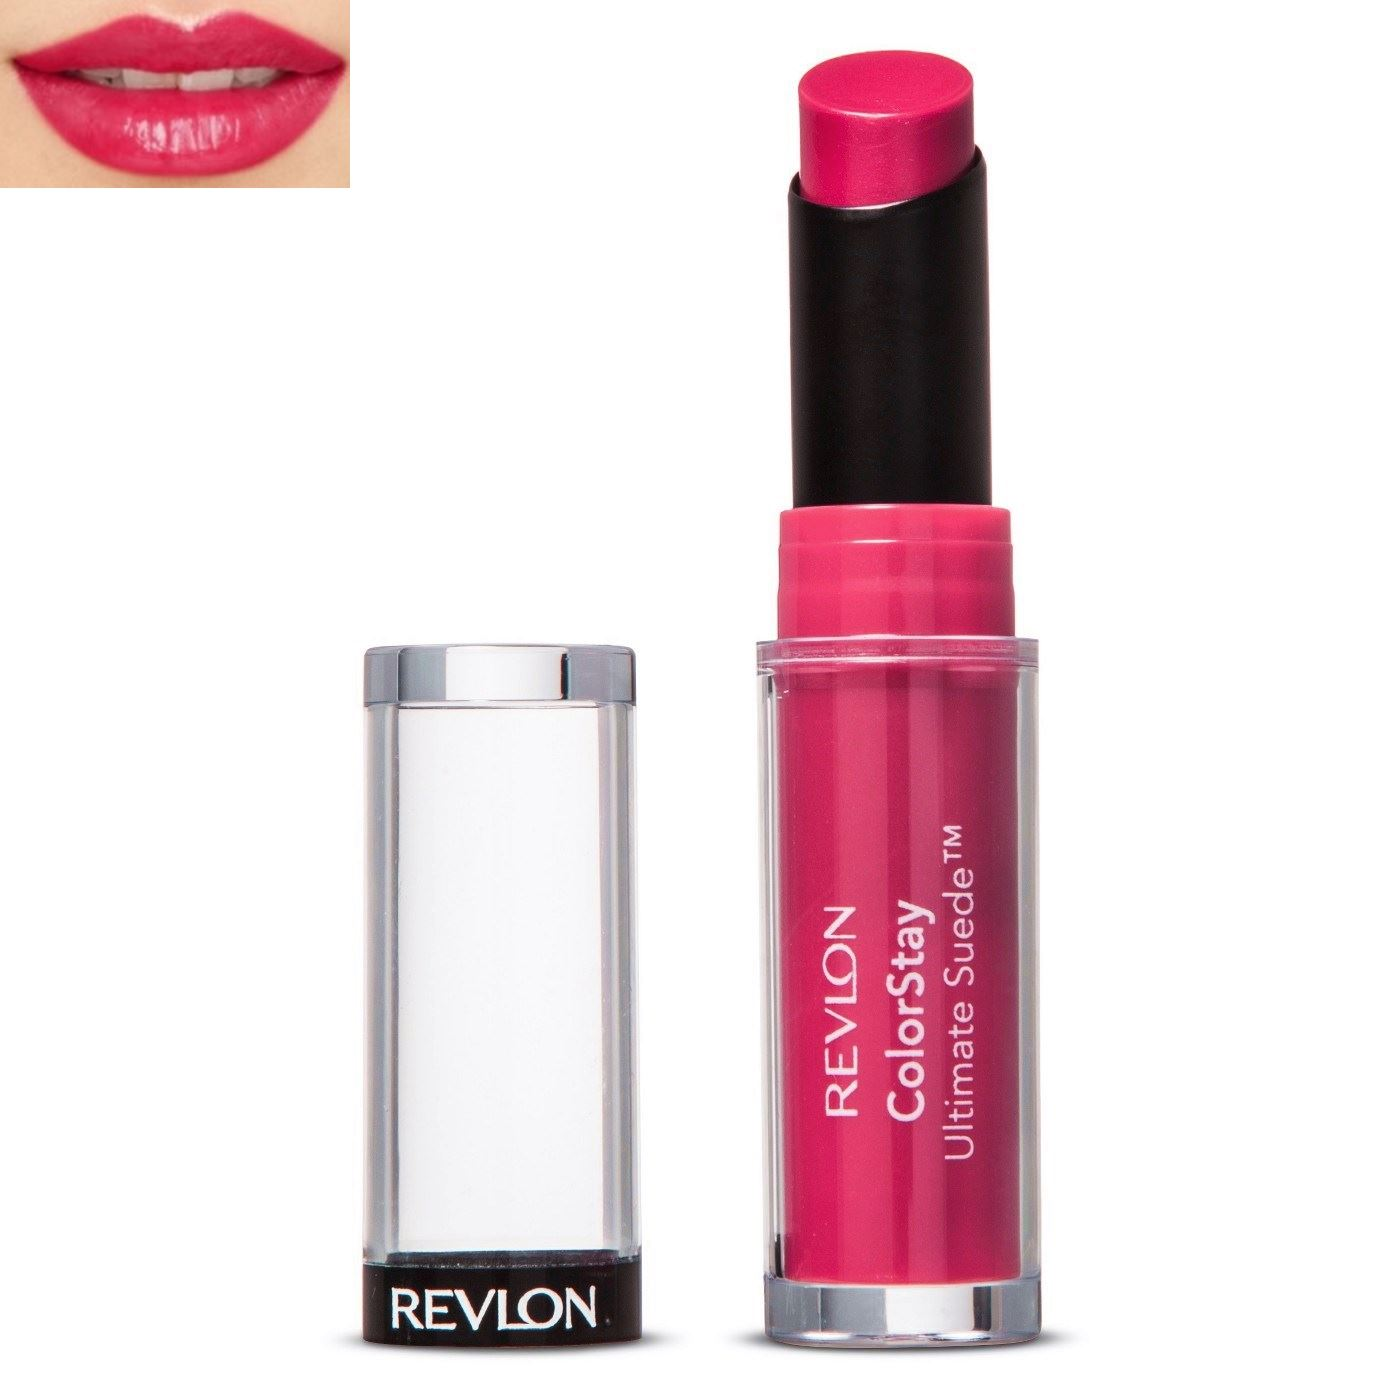 Revlon ColorStay Ultimate Suede Lipstick 073 Stylist